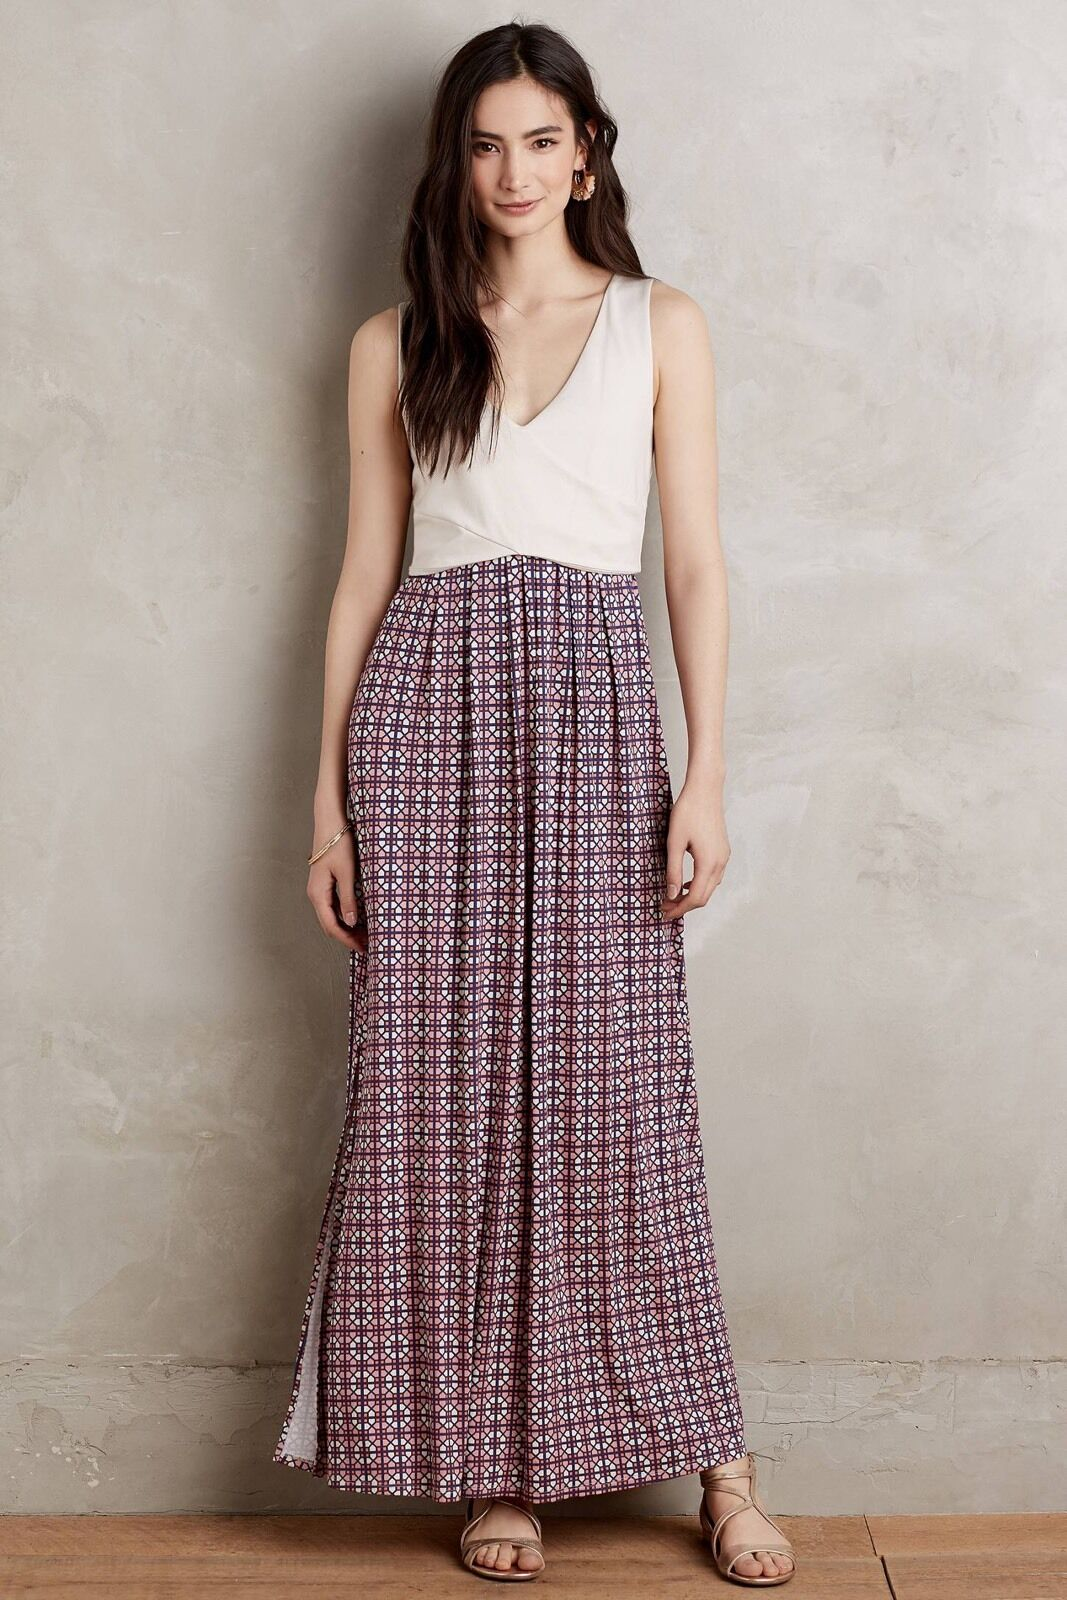 Elysian Maxi Maxi Maxi Dress Size M Maeve NWT 07c221